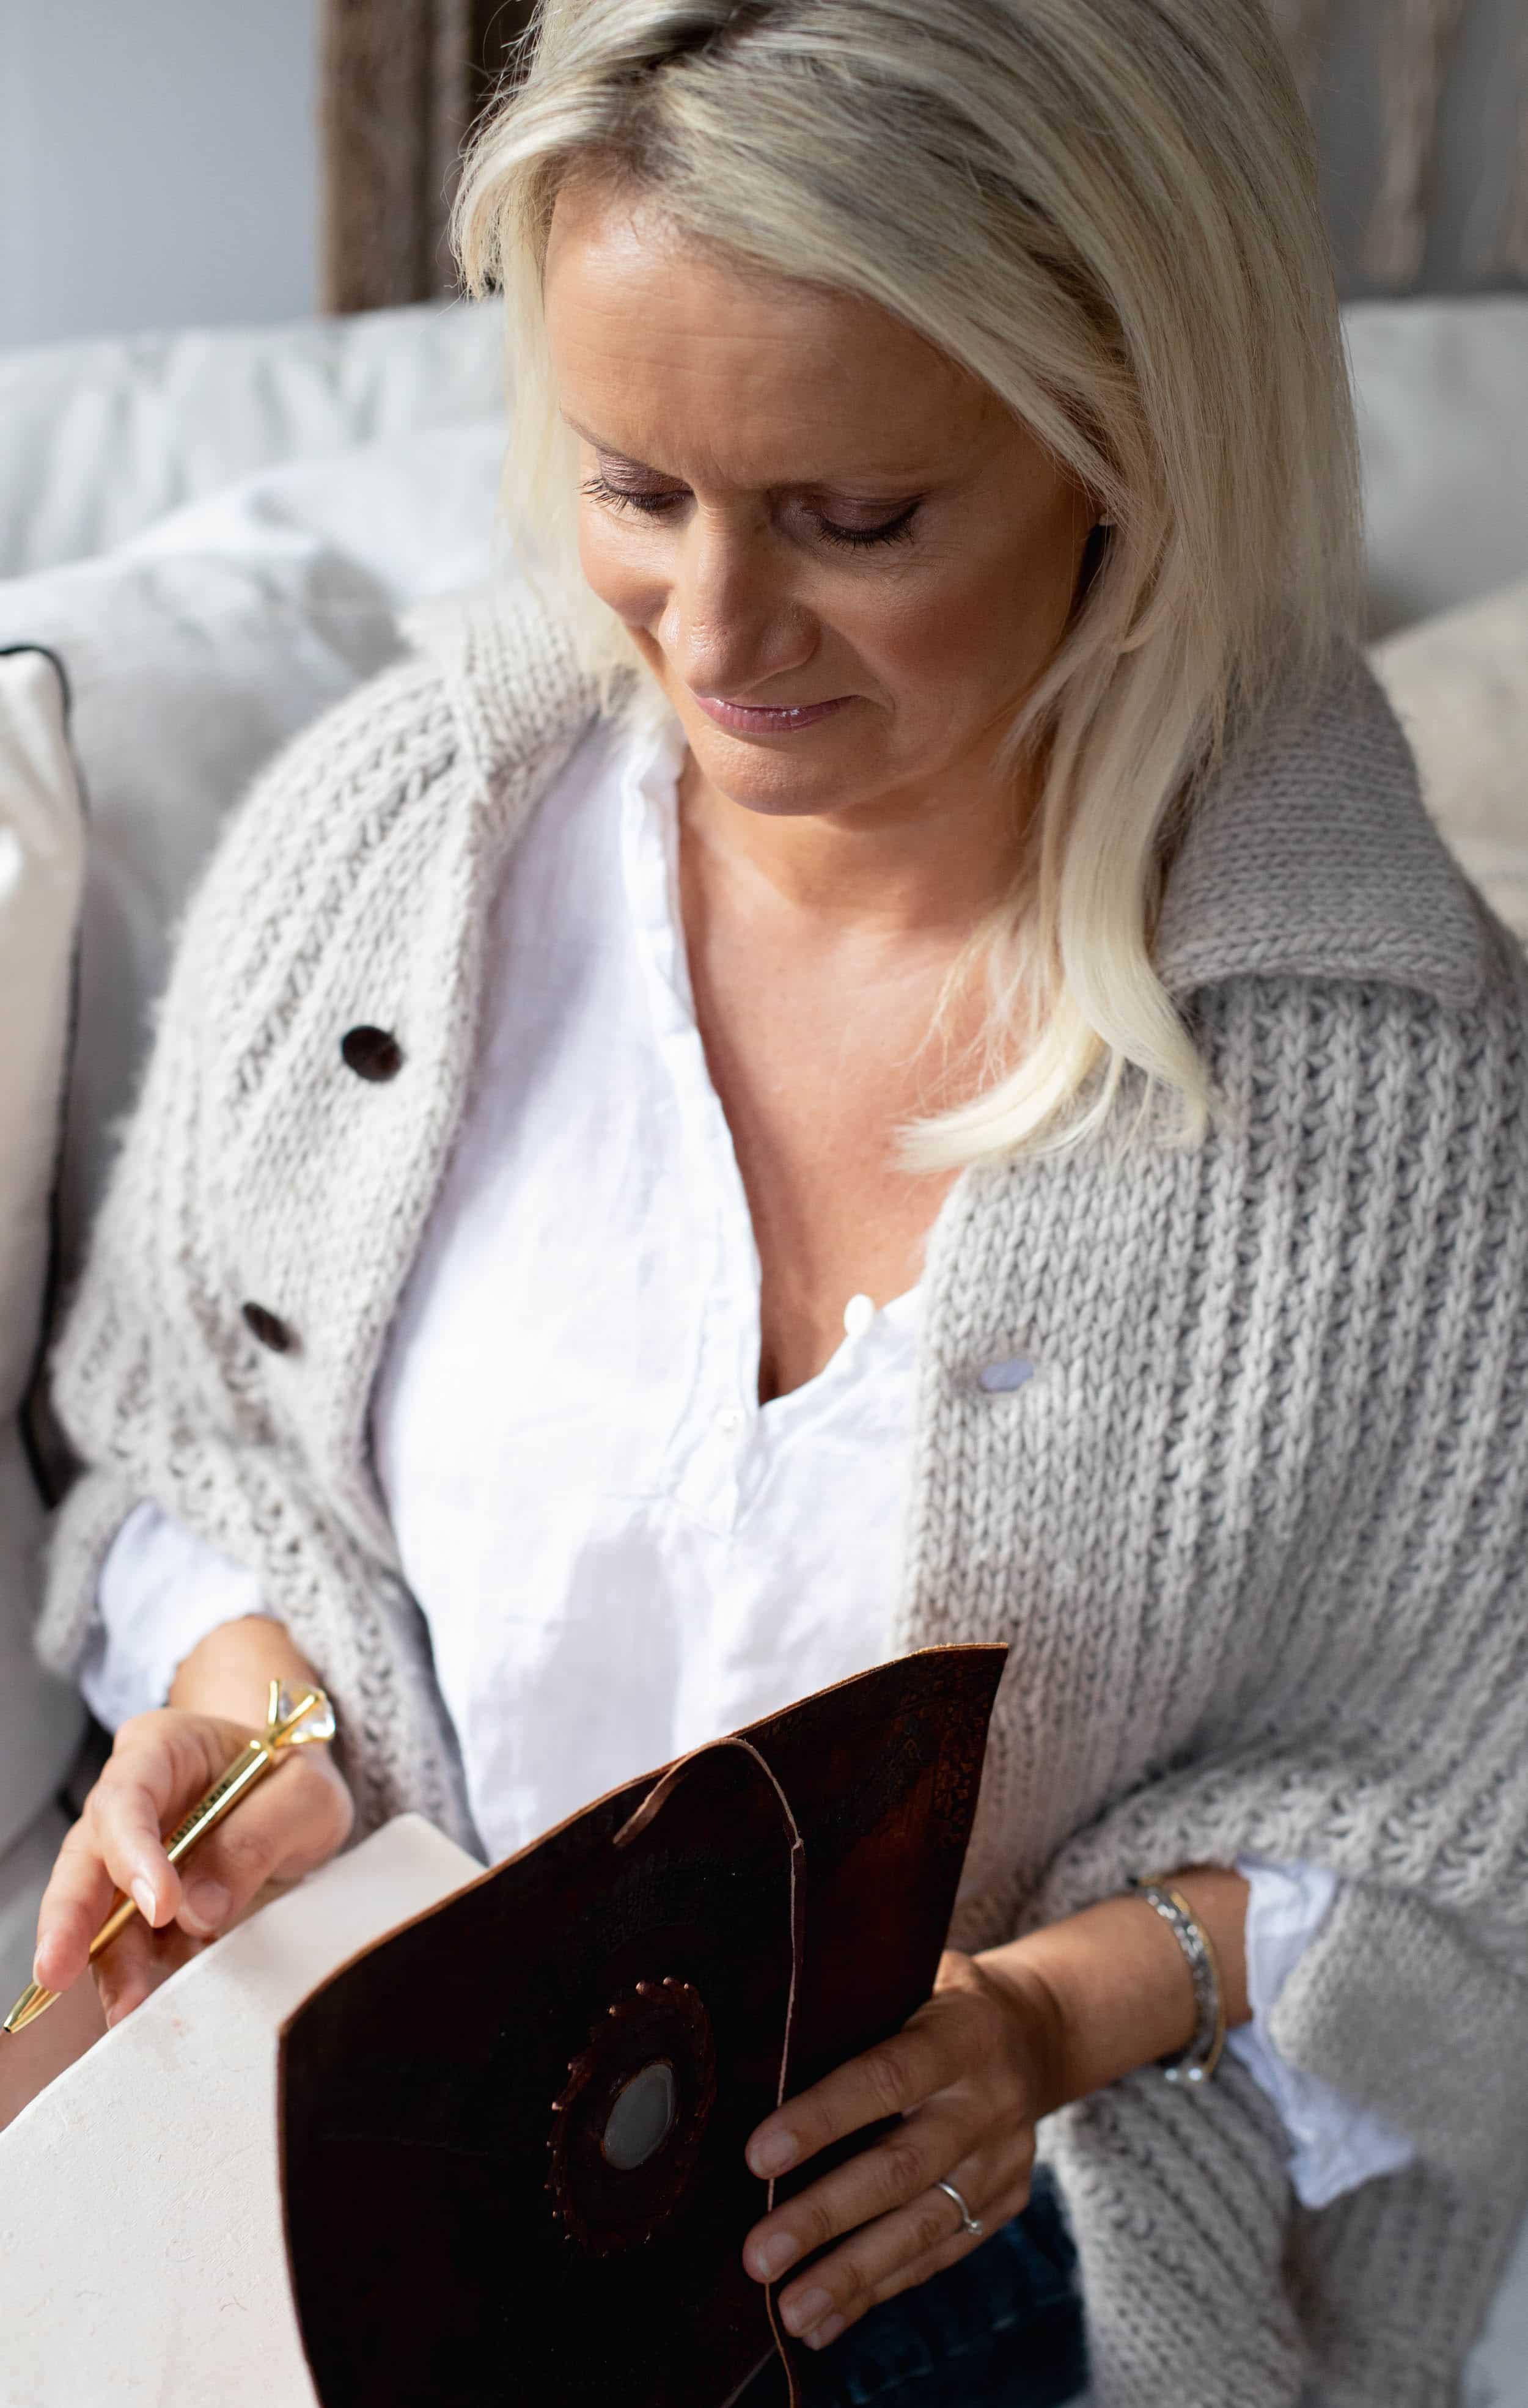 forældre vejledning Fyn - forældre vejledning Odense - forældre vejledning Svendborg - forældre vejledning Rudkøbing - forældre vejledning Tranekær